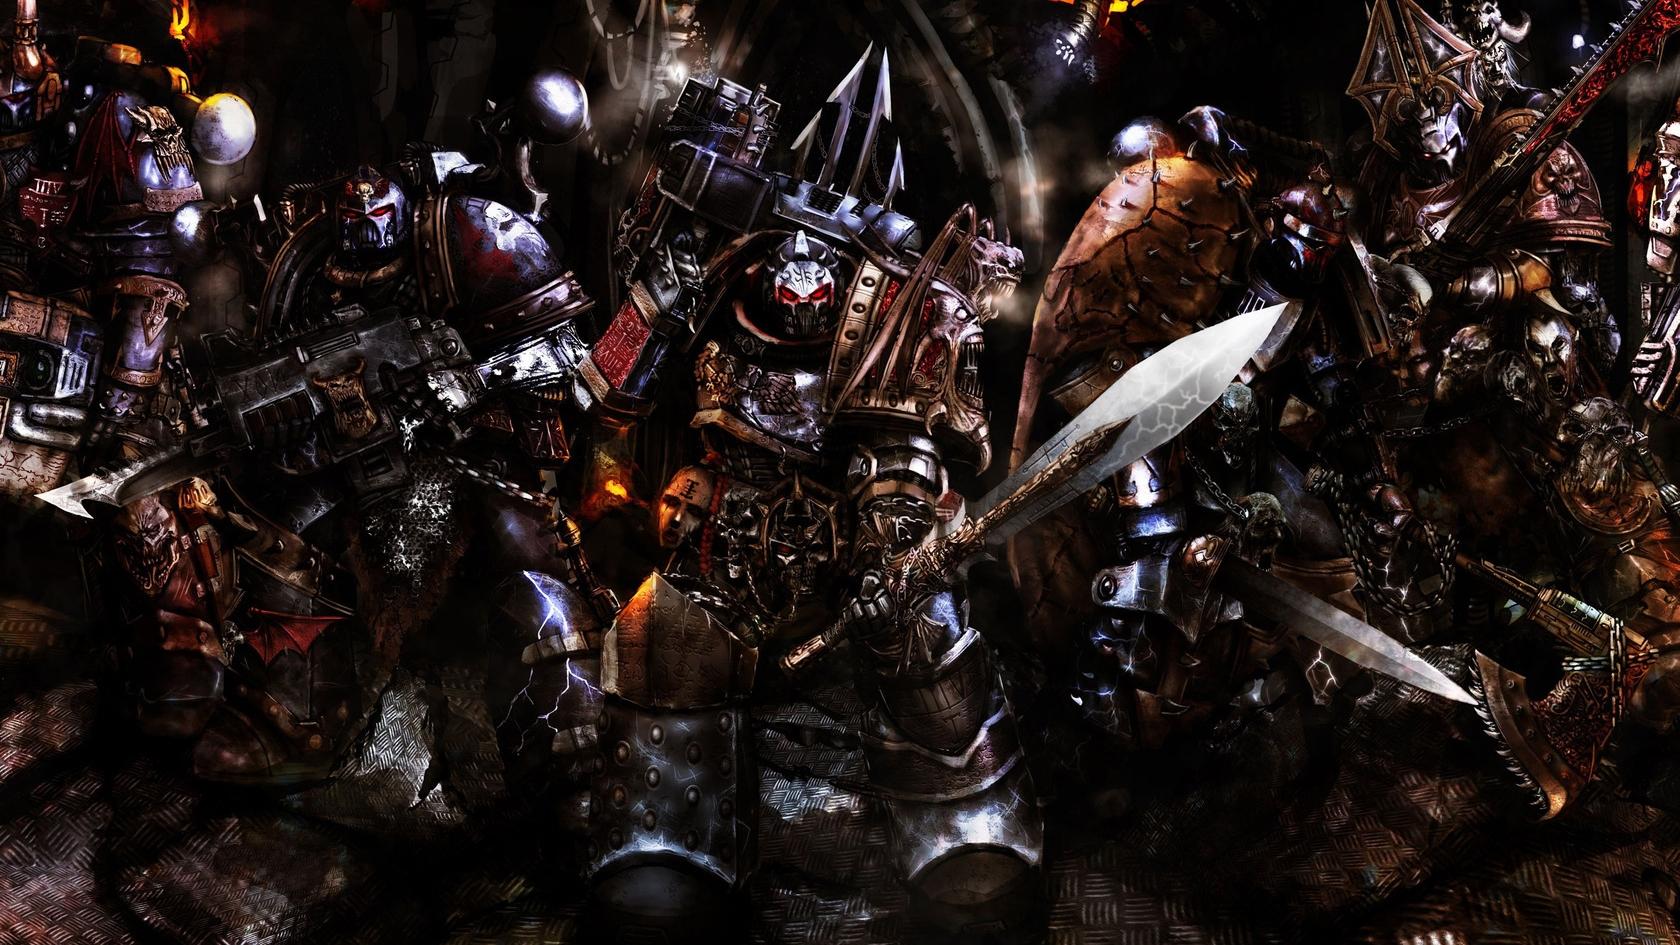 warhammer 40k wallpaper 1680x1050 - photo #26